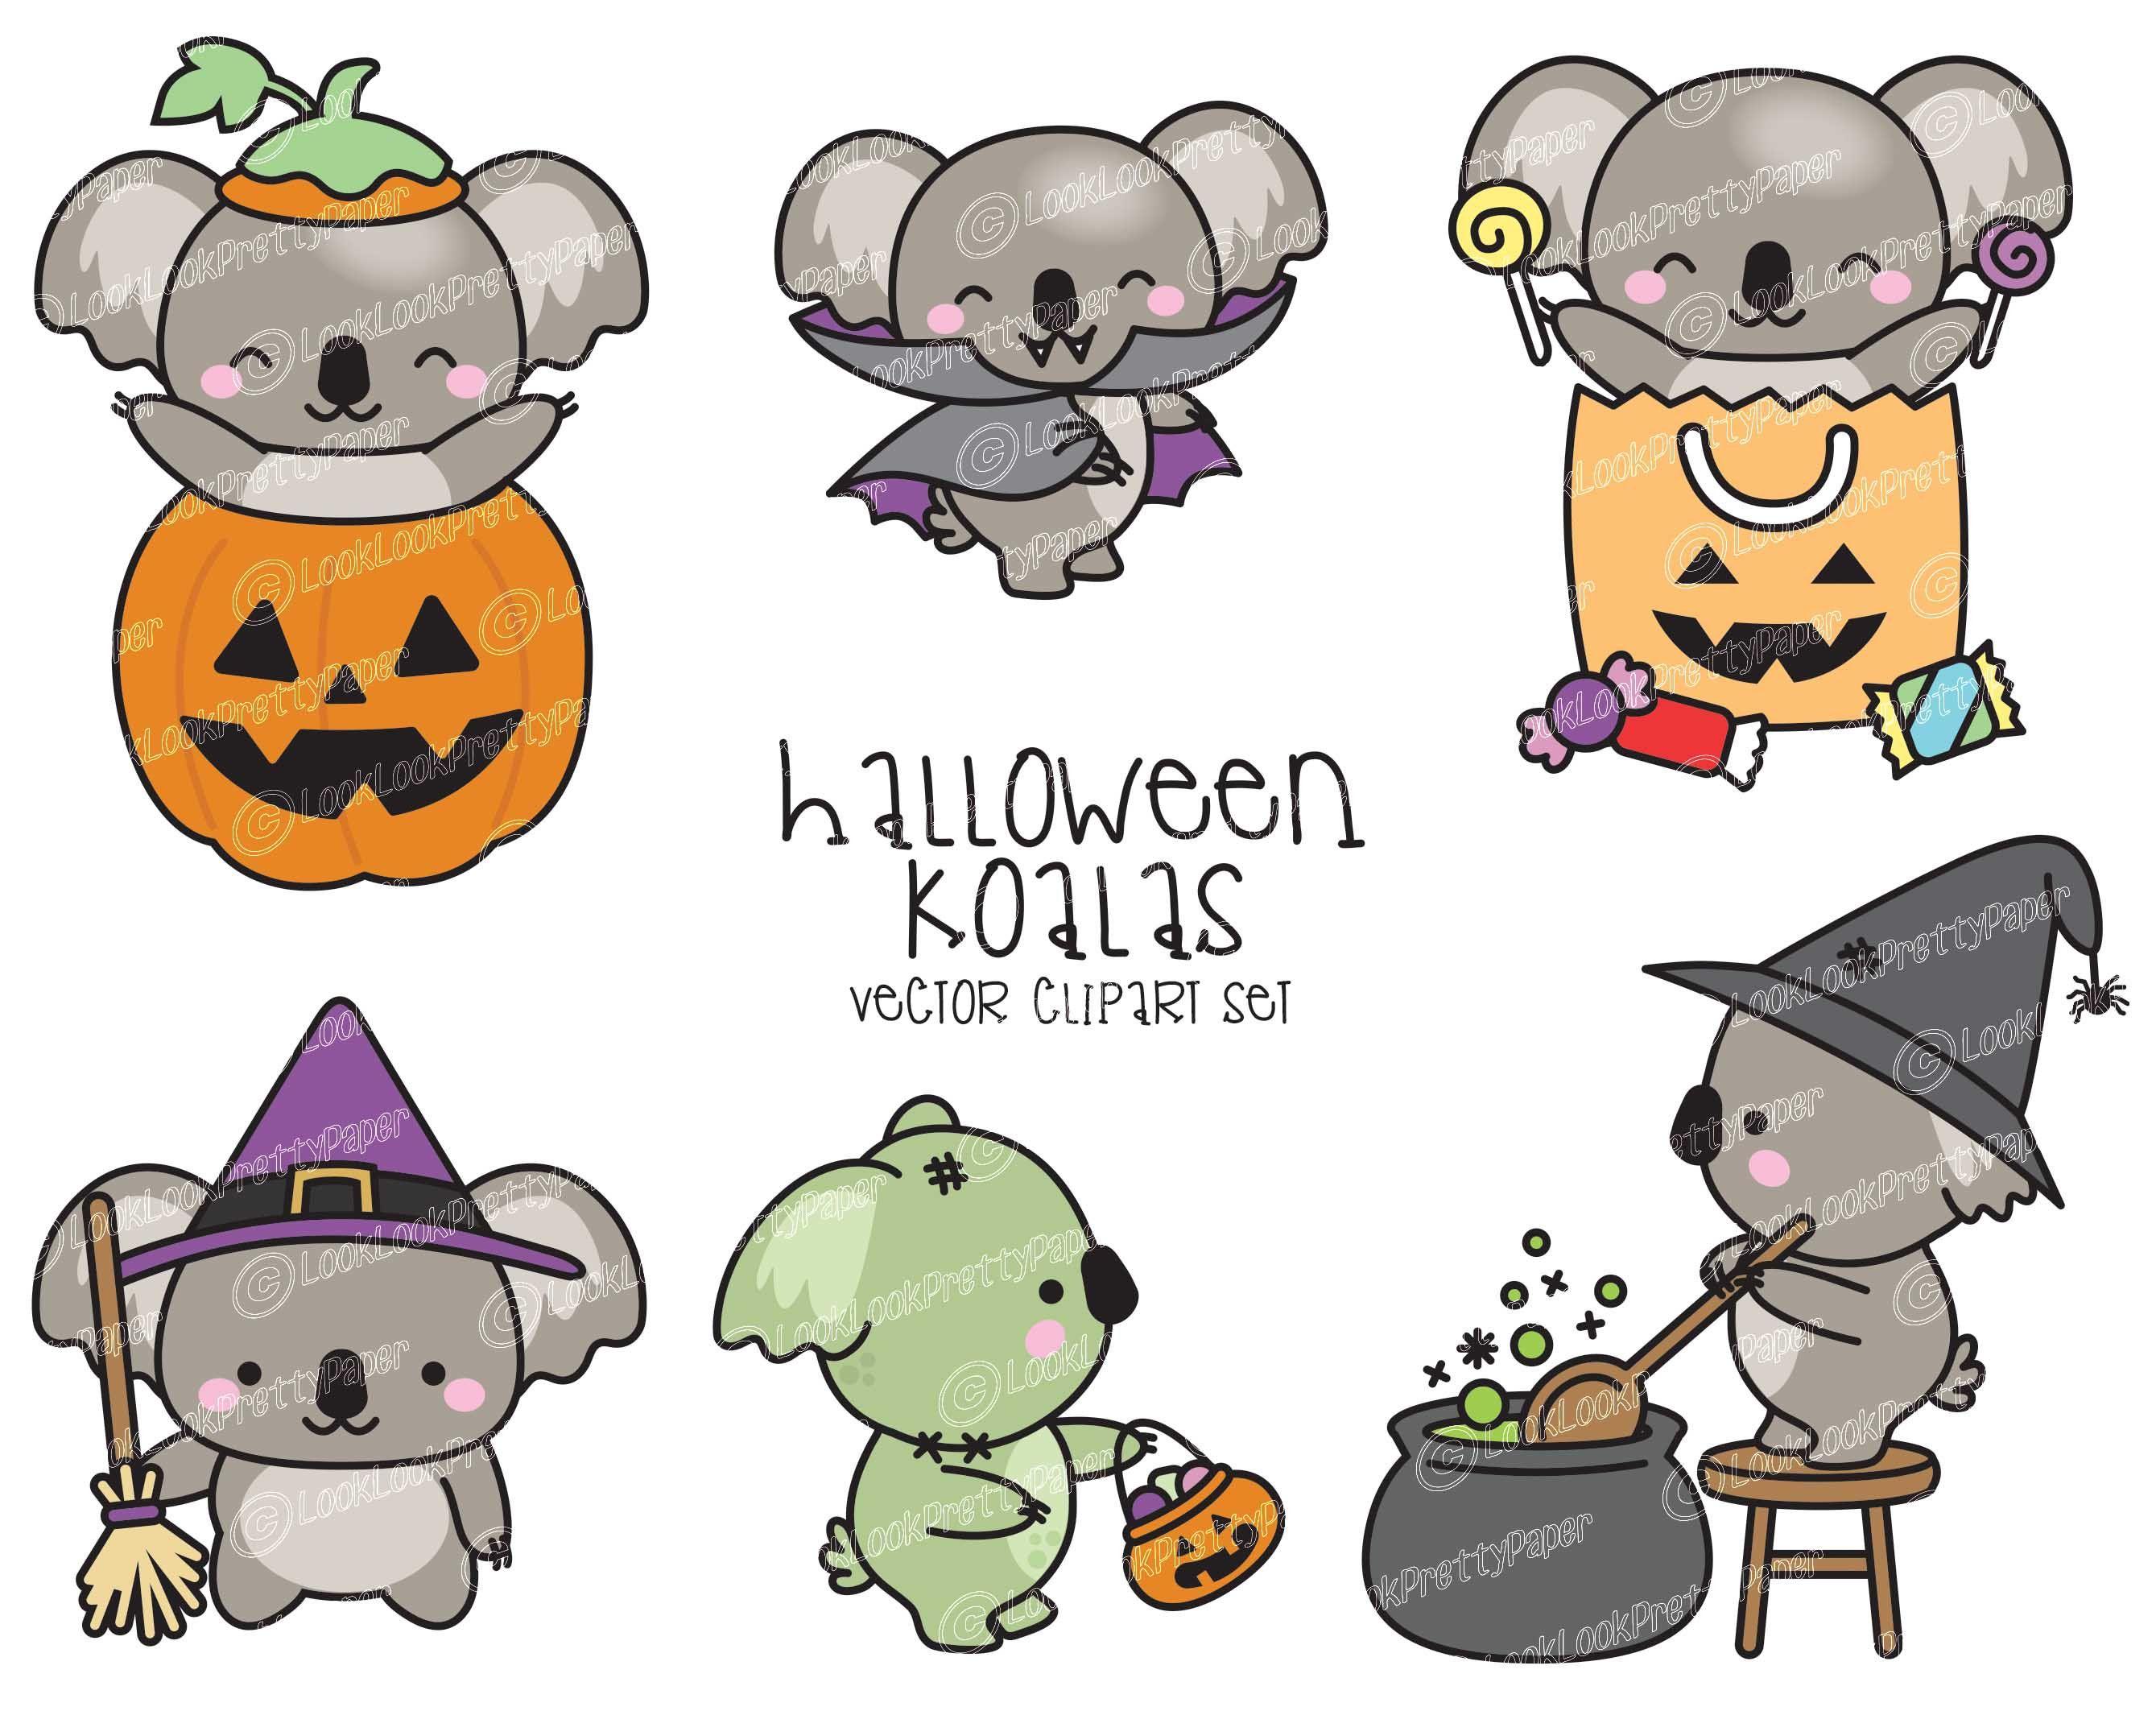 Premium Vector Clipart Kawaii Halloween Koalas Cute Etsy In 2021 Kawaii Halloween Cute Cartoon Wallpapers Koala Drawing